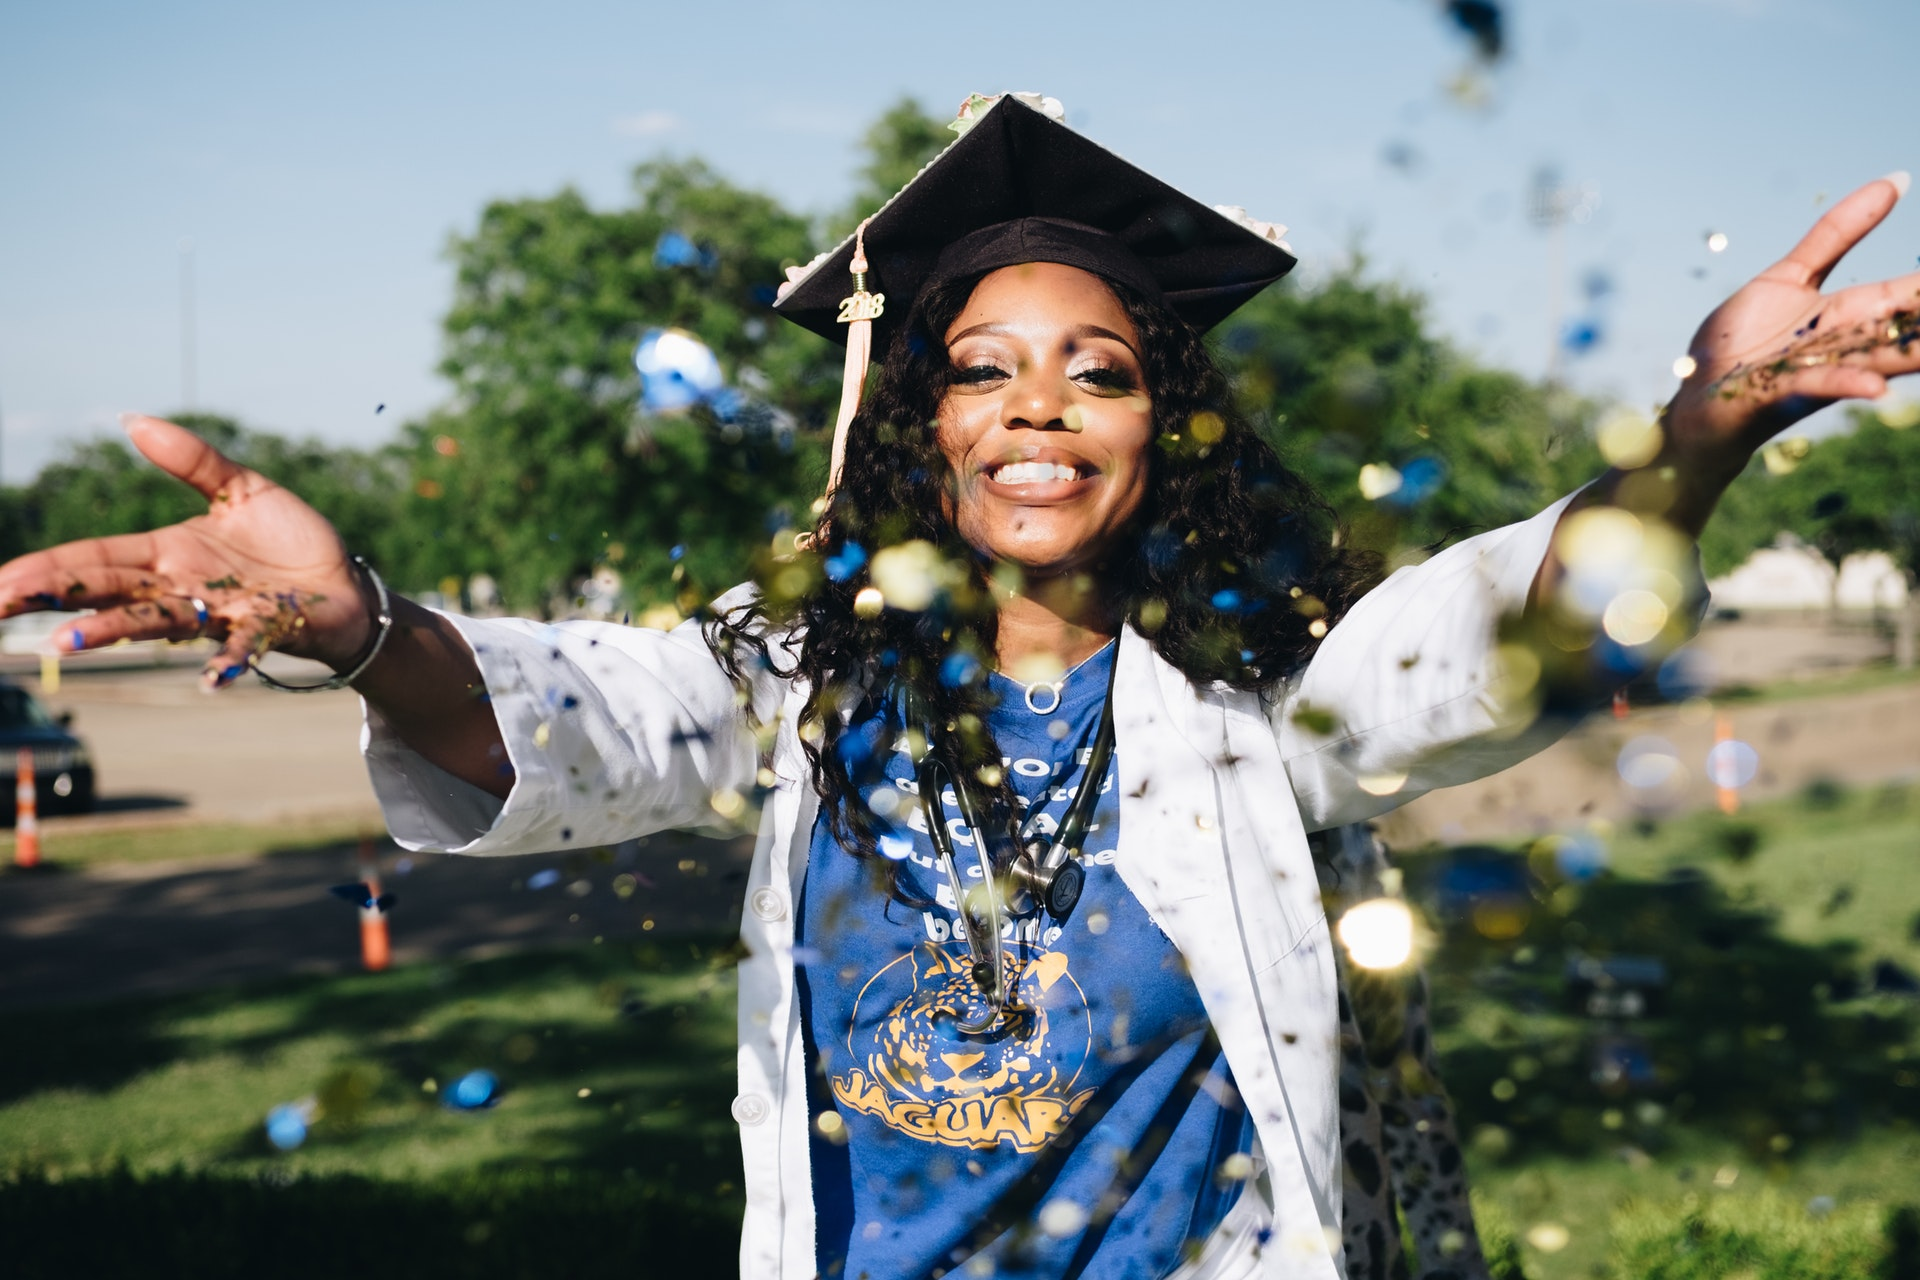 confetti-girl-graduation-1139317.jpg